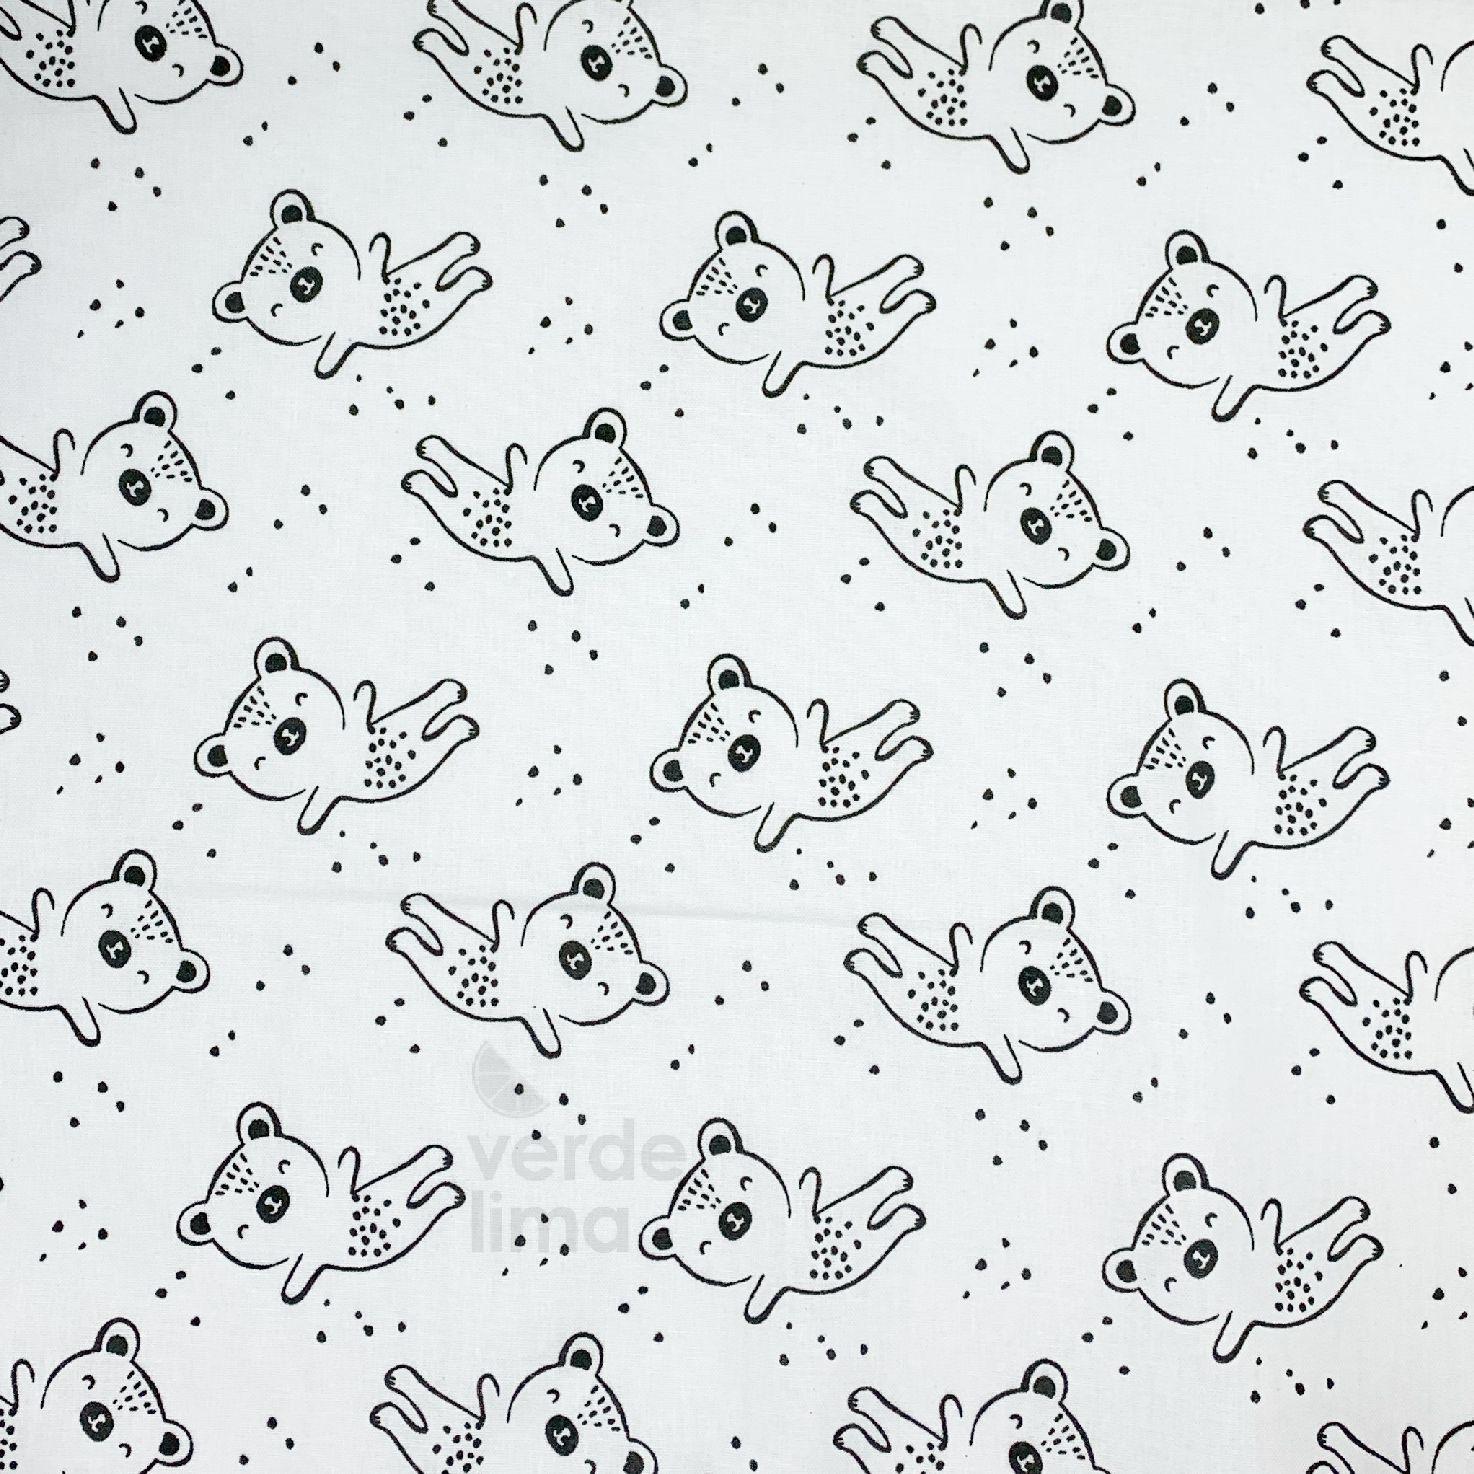 Astro kitty and friends - ursos fundo branco